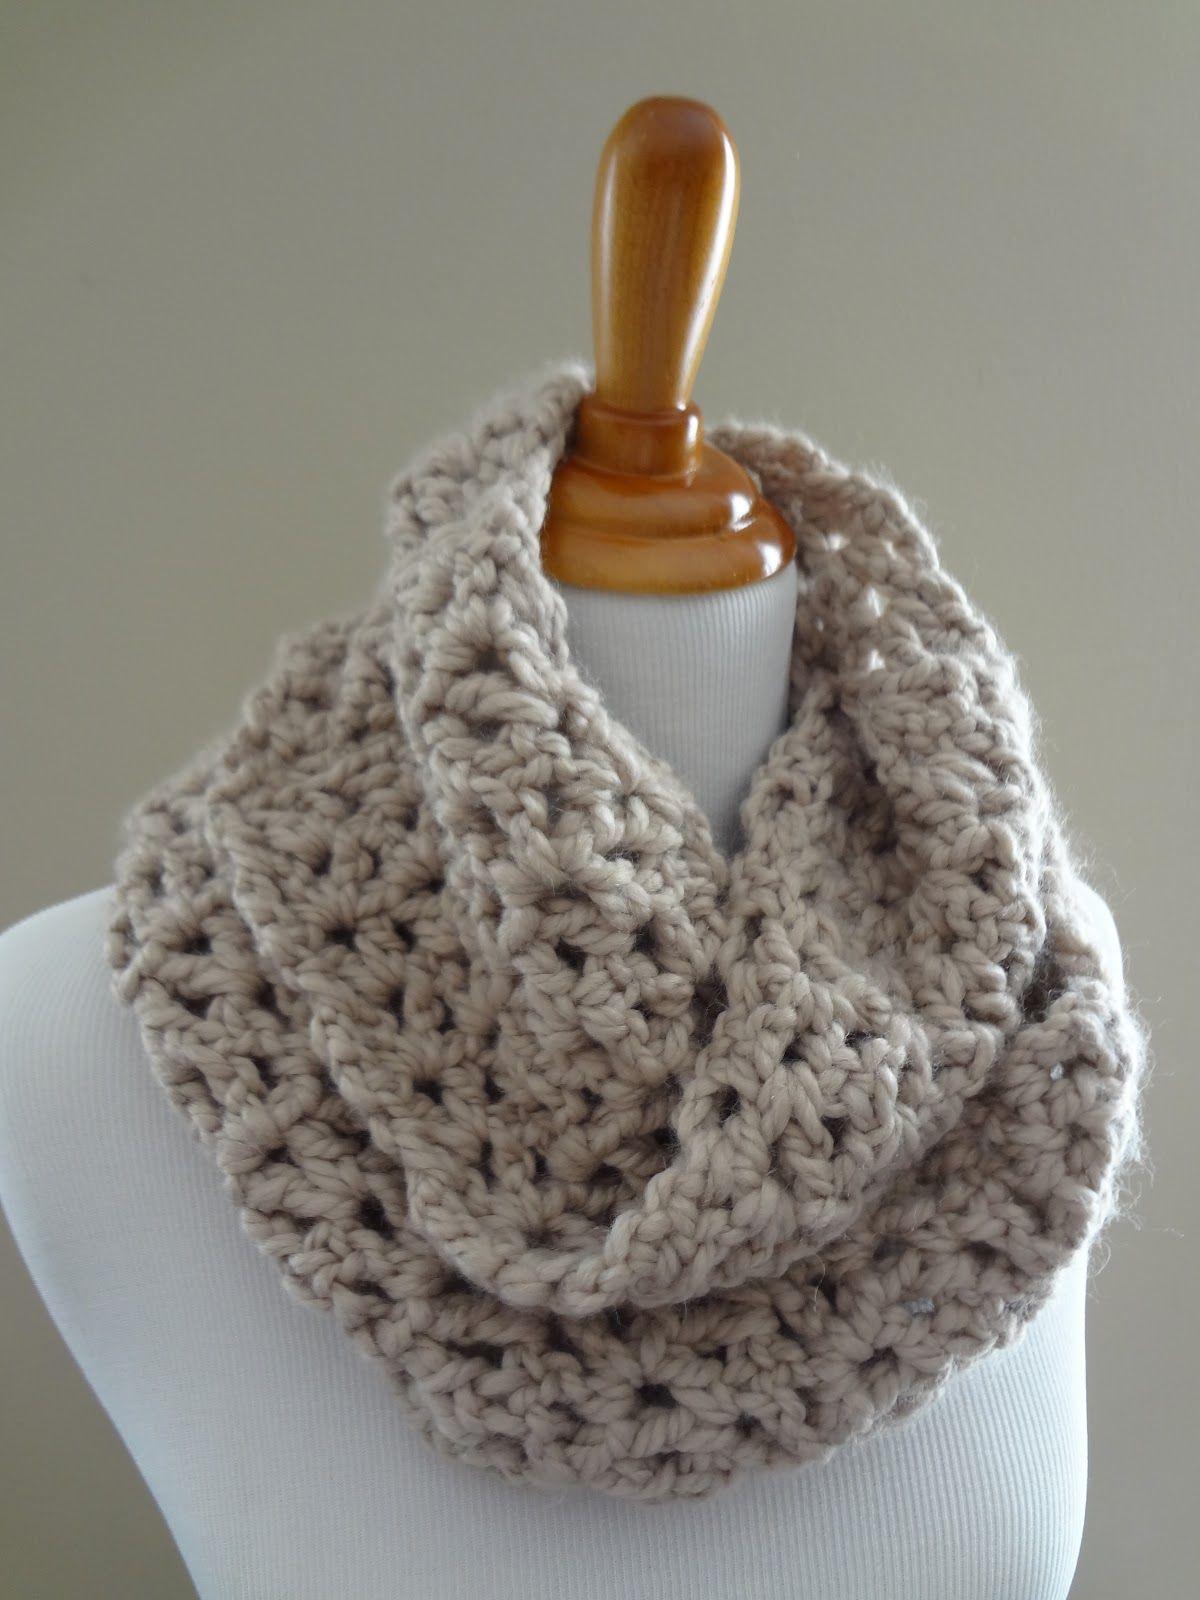 crochet scarf patterns free | ... in Stitching: Free Crochet Pattern ...